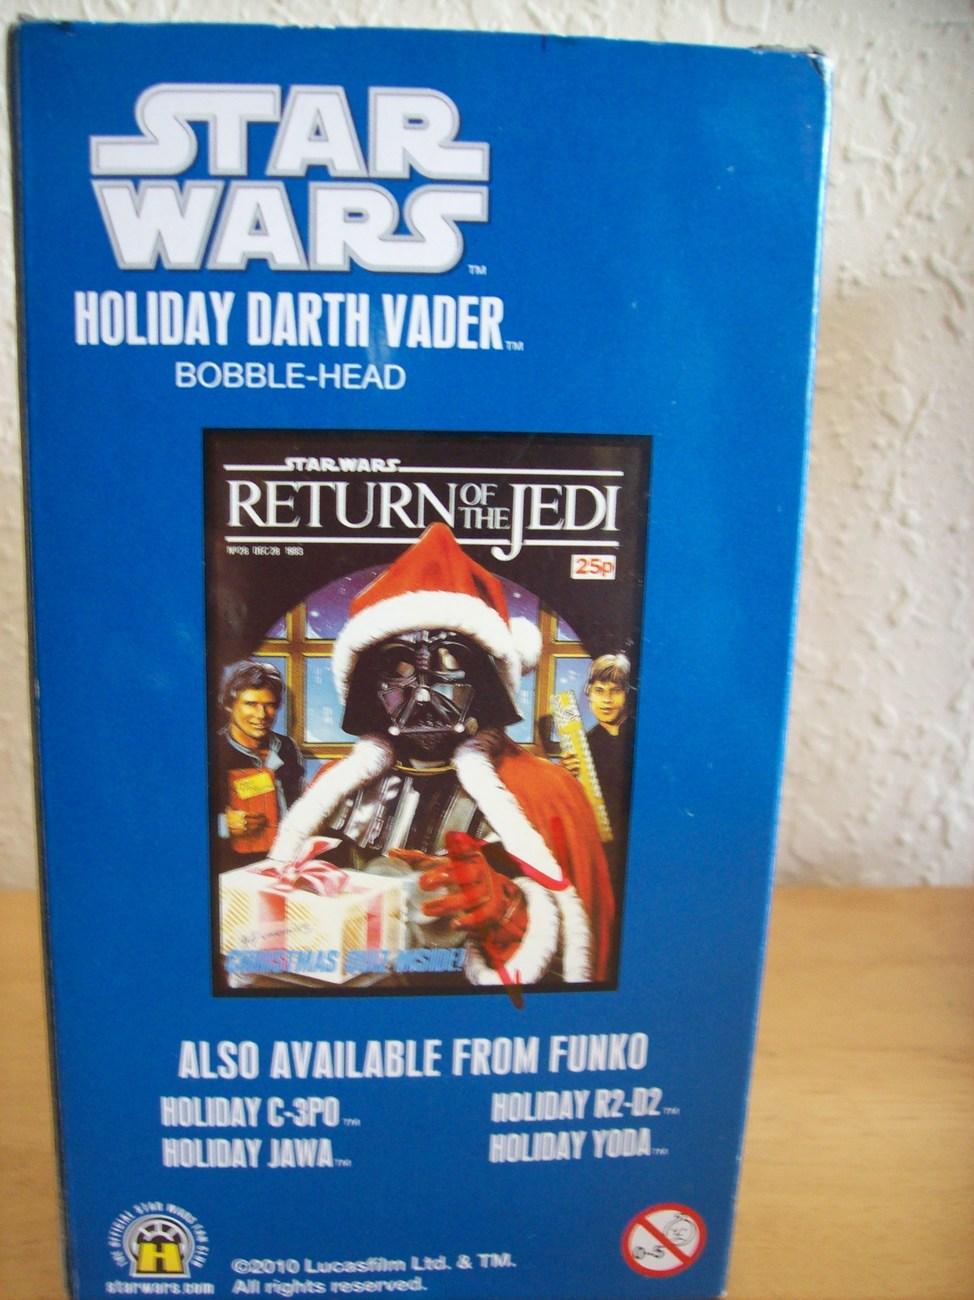 2010 Star Wars Holiday Darth Vader Bobble-Head Figurine